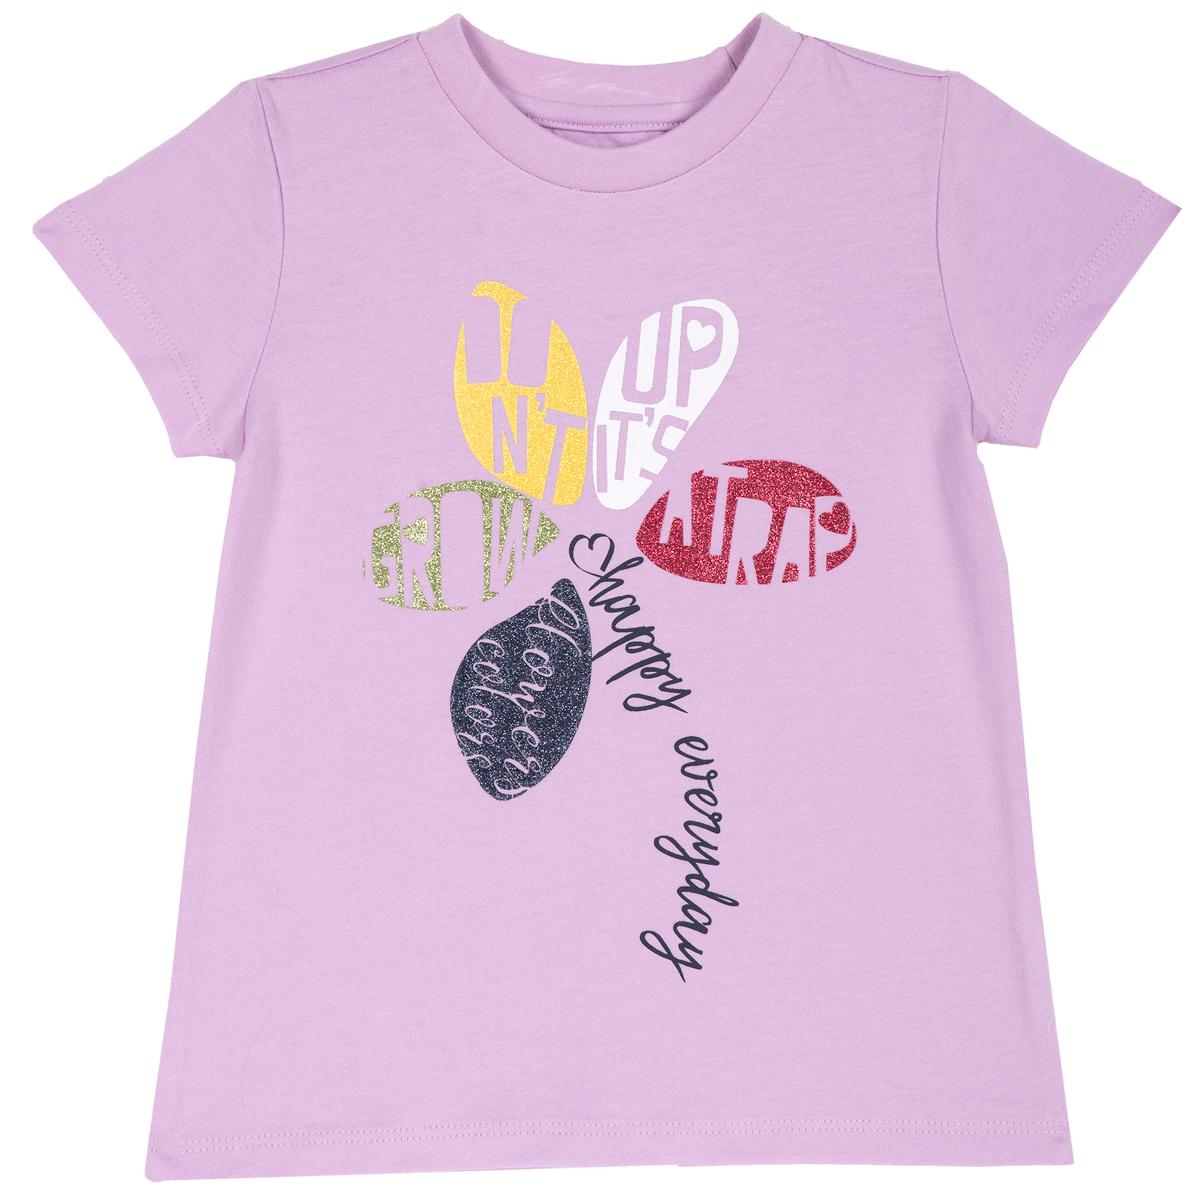 Tricou copii Chicco, maneca scurta, lila, 06608 din categoria Tricouri copii